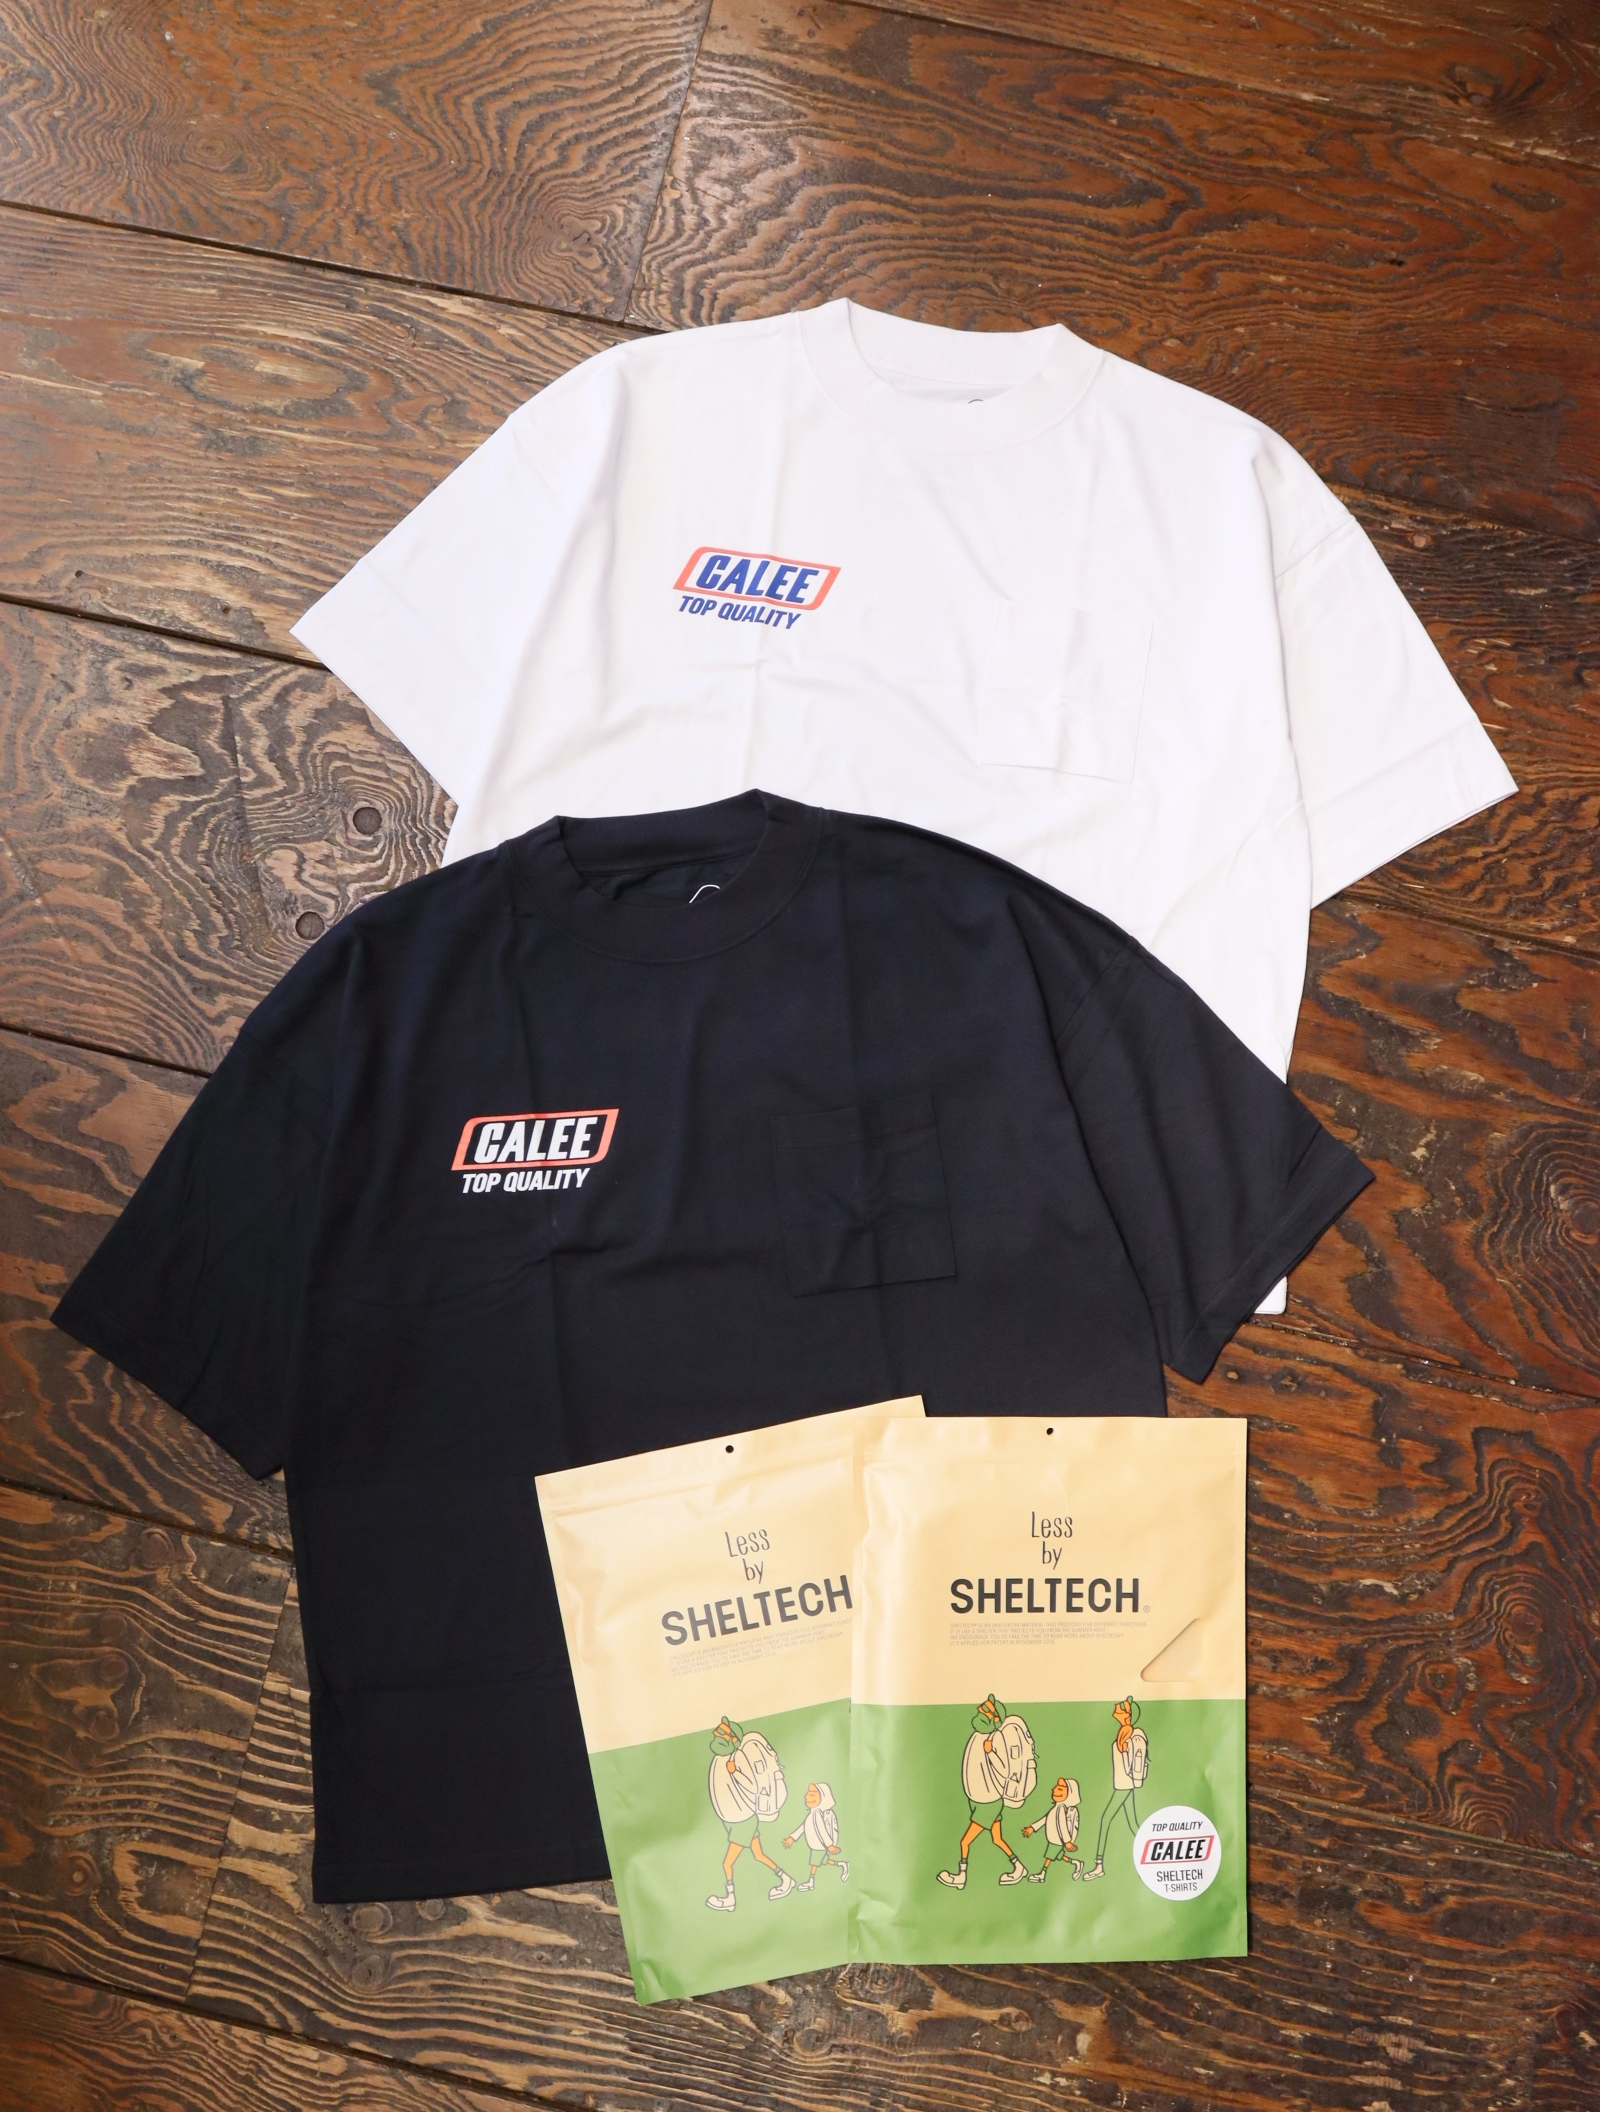 CALEE × SHELTECH 「DROP SHOULDER T-SHIRT 」   ドロップショルダーティーシャツ